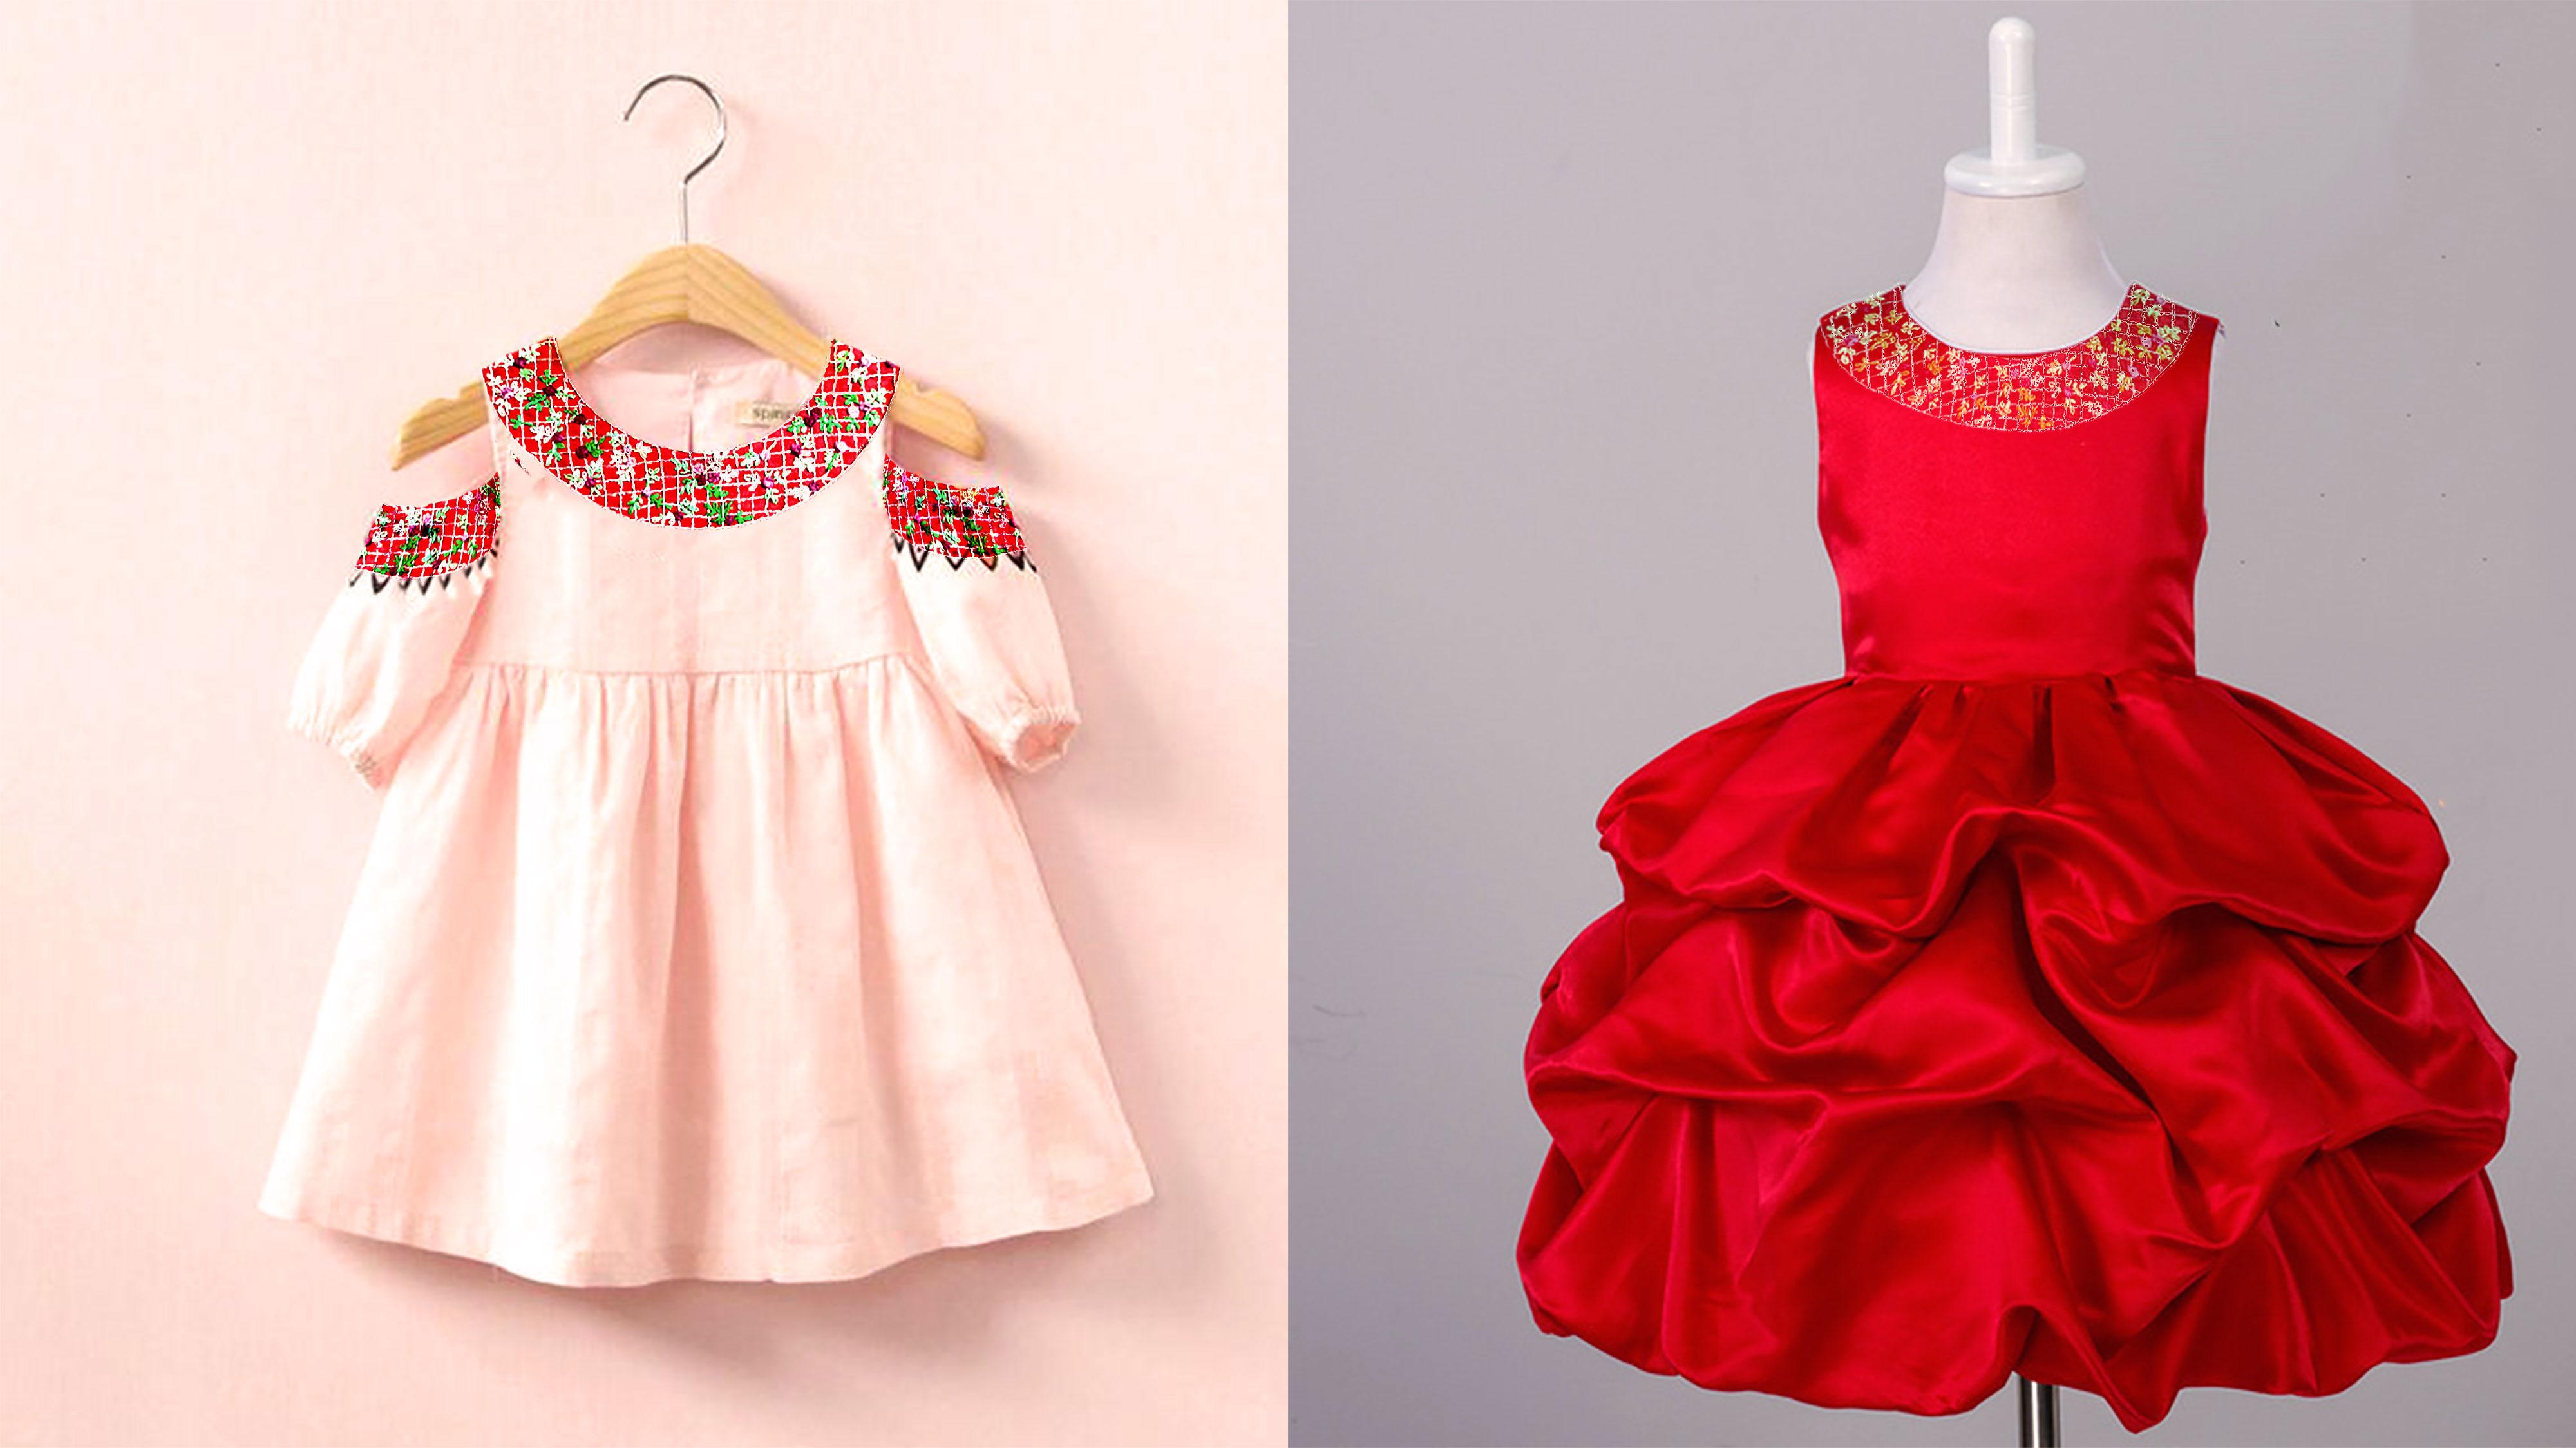 Hand Embroidery Design Tutorial For Of Baby And Kids Dress Shopno Dana,Adobe Illustrator 3d P Logo Design